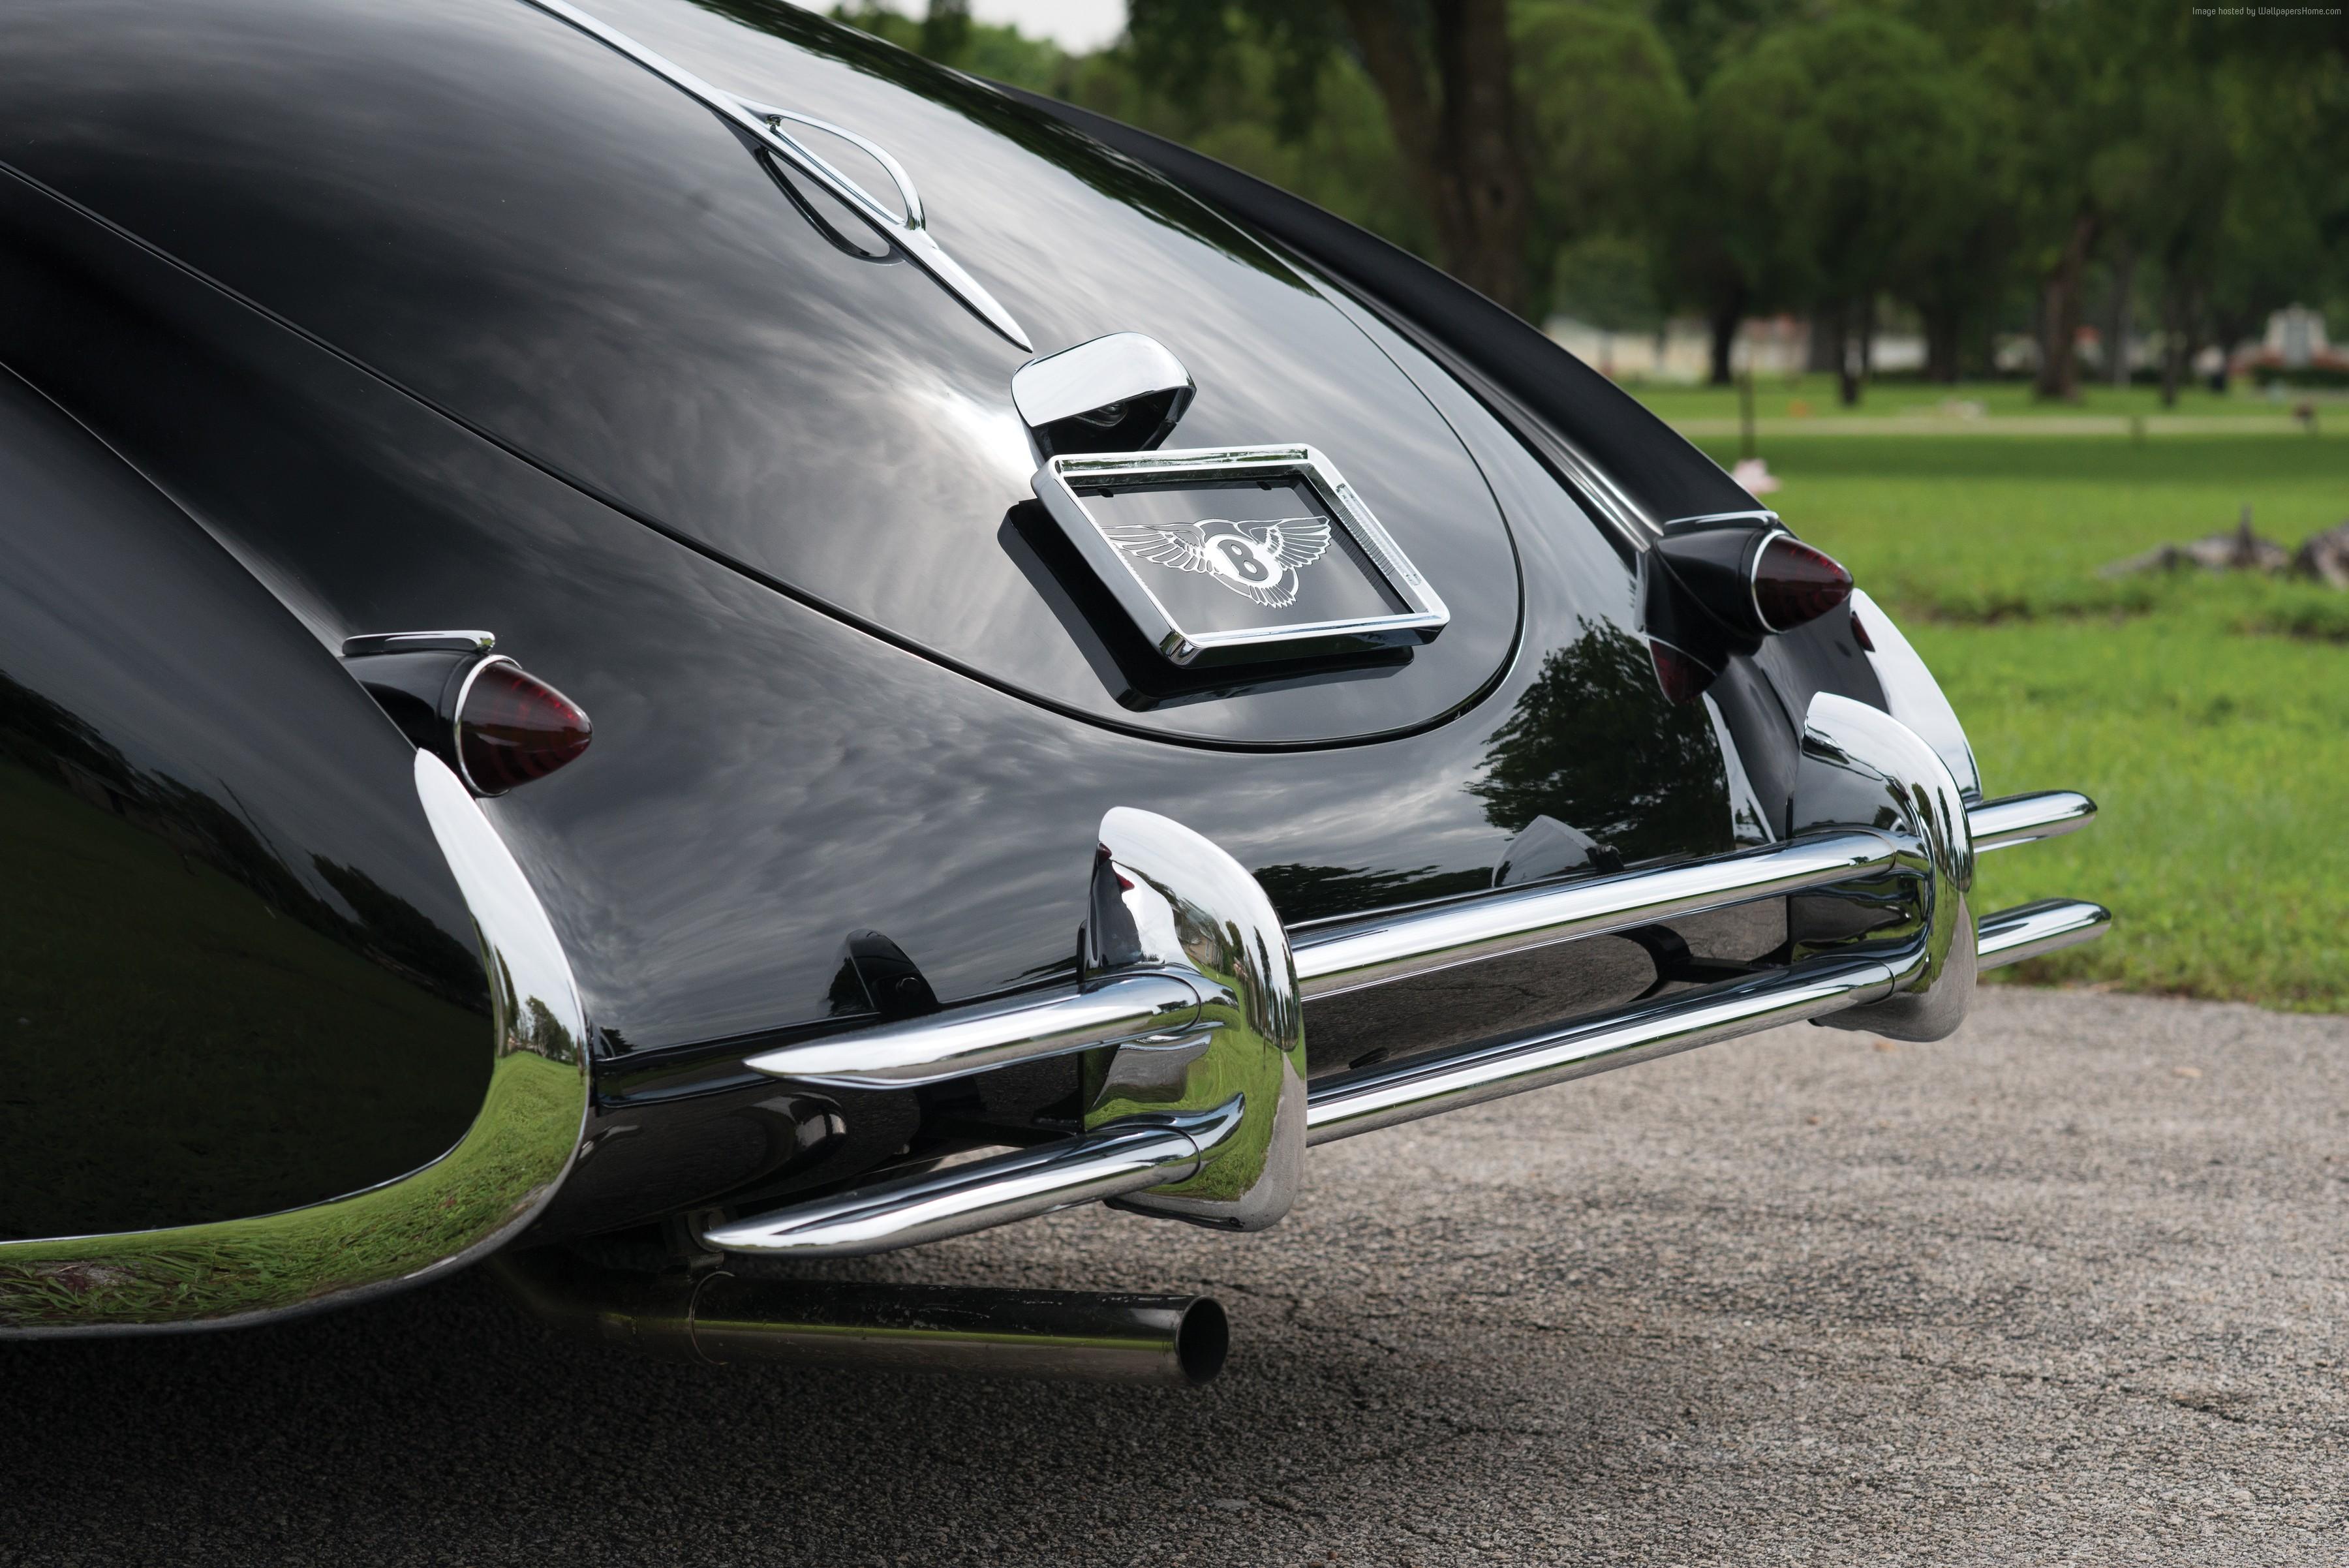 115221-bentley-mark-vi-luxury-cars-bentley-classic-cars-logo-1947-back-black